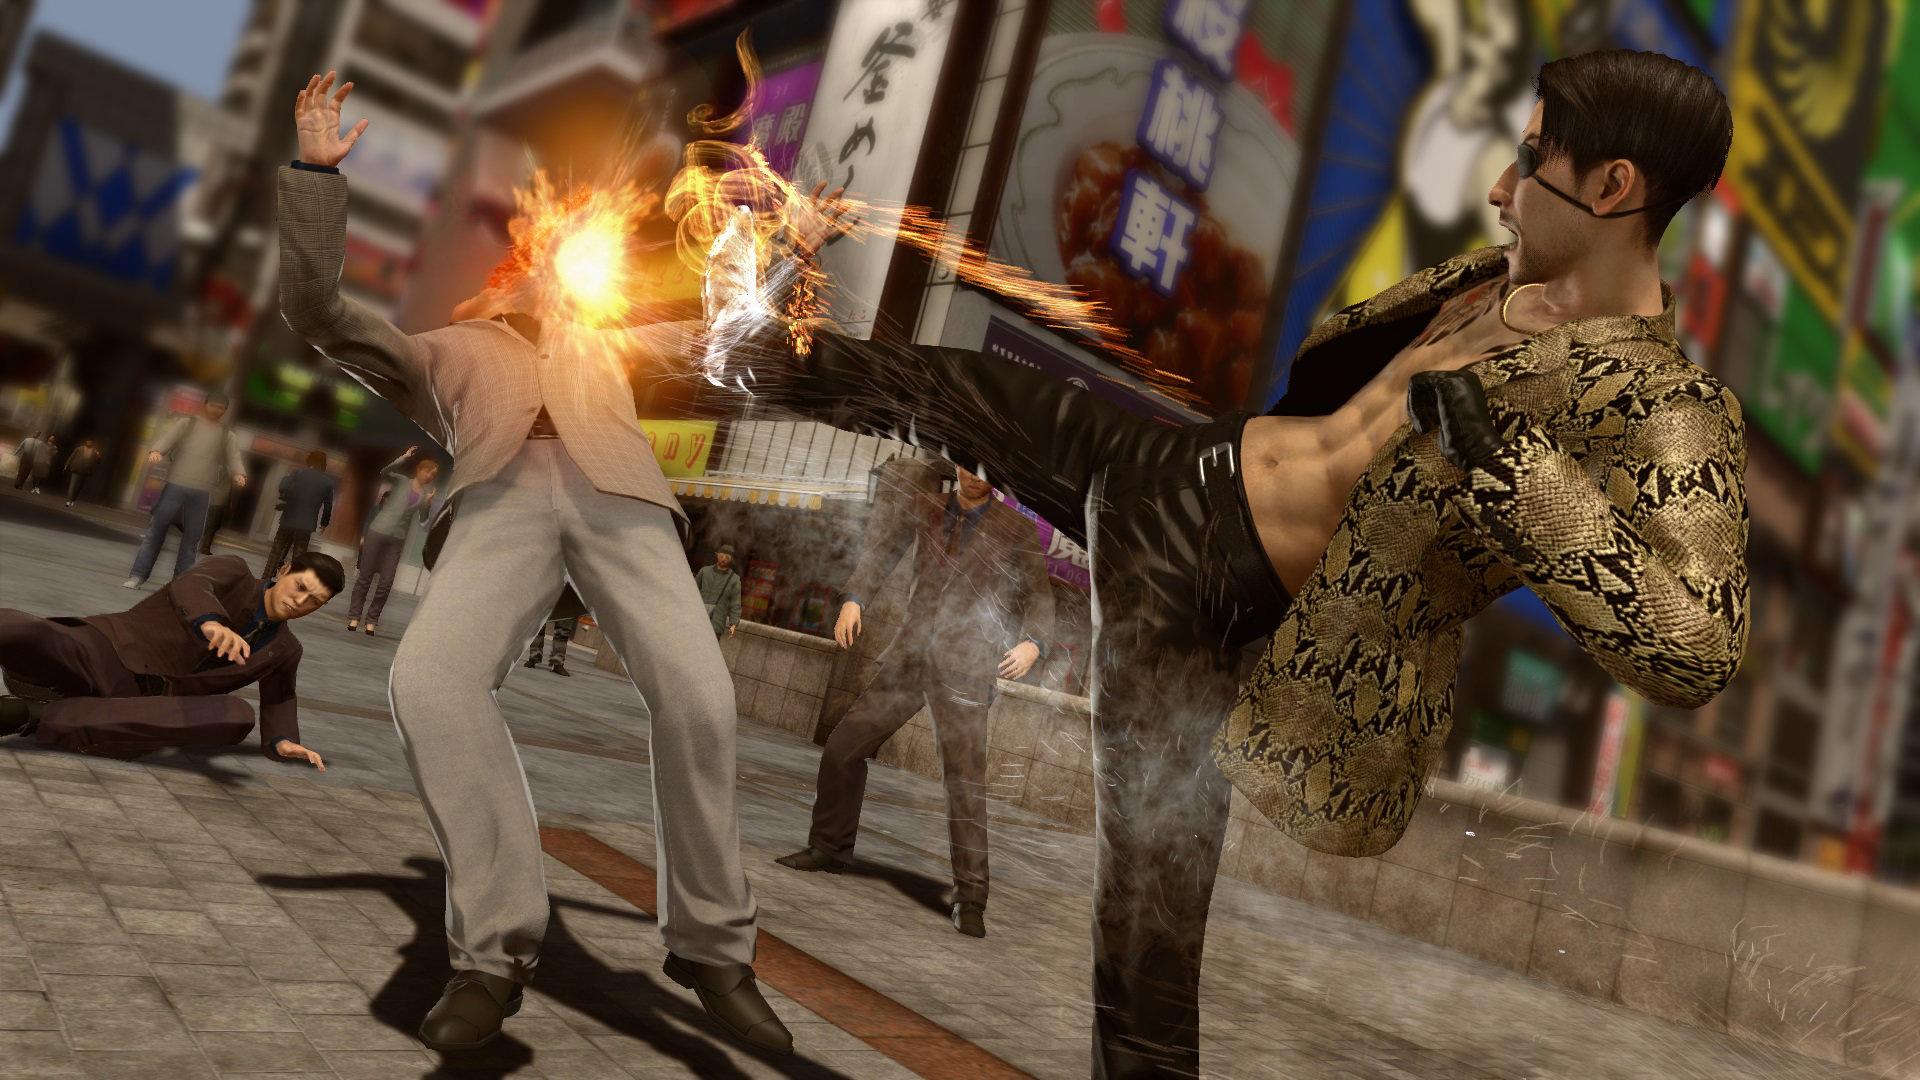 Yakuza Kiwami 2 PC setting up shop on Steam in May screenshot